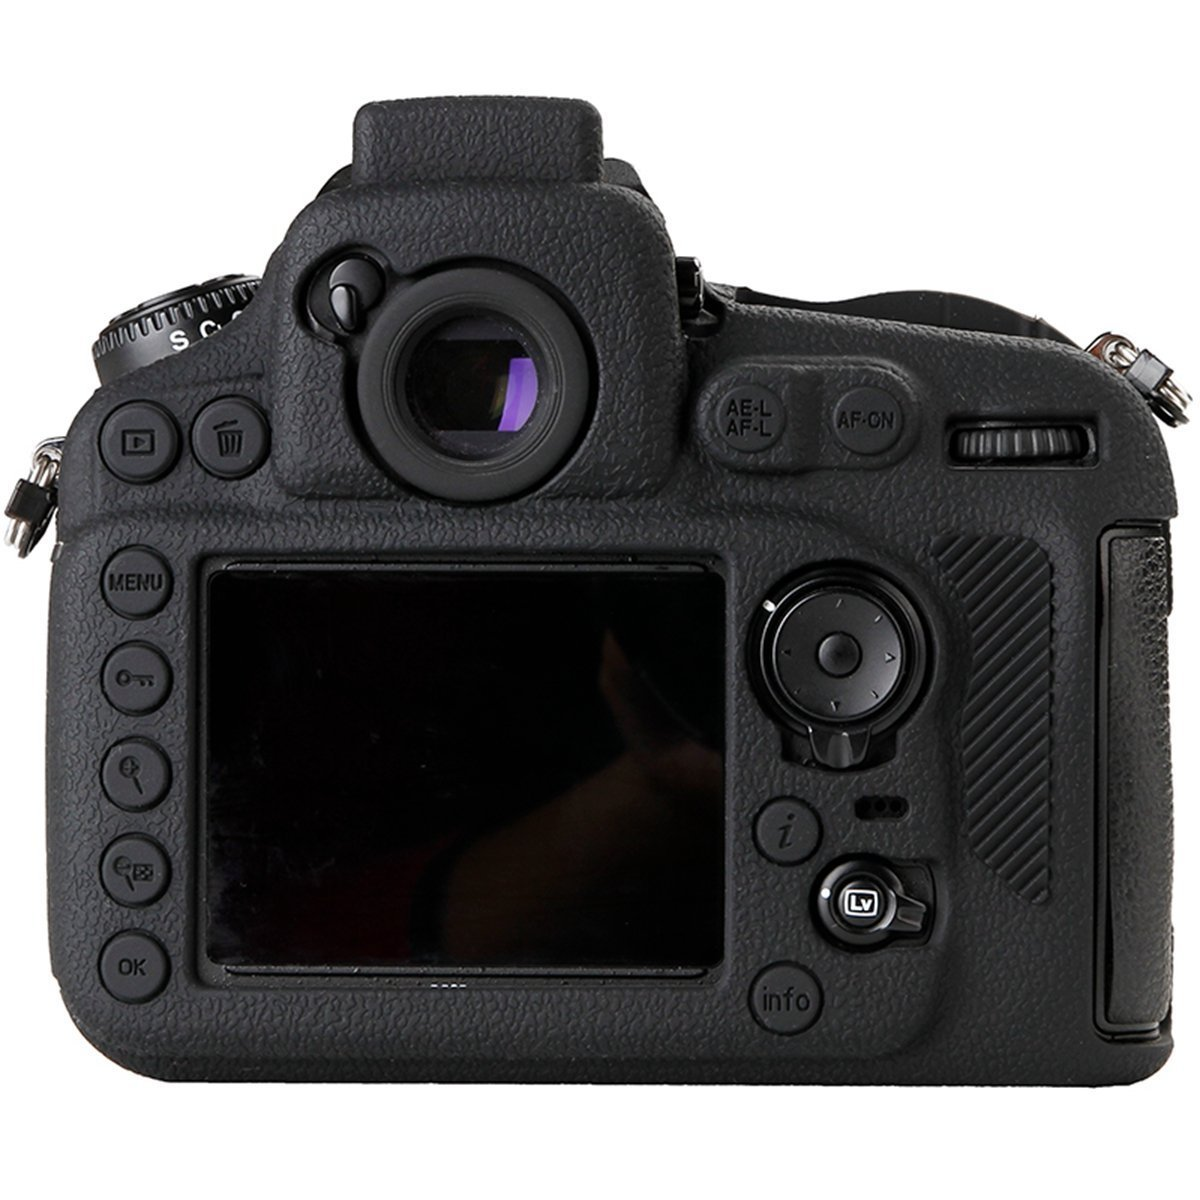 Amazon.com: hellopower Nikon D810 suave silicona armadura de ...